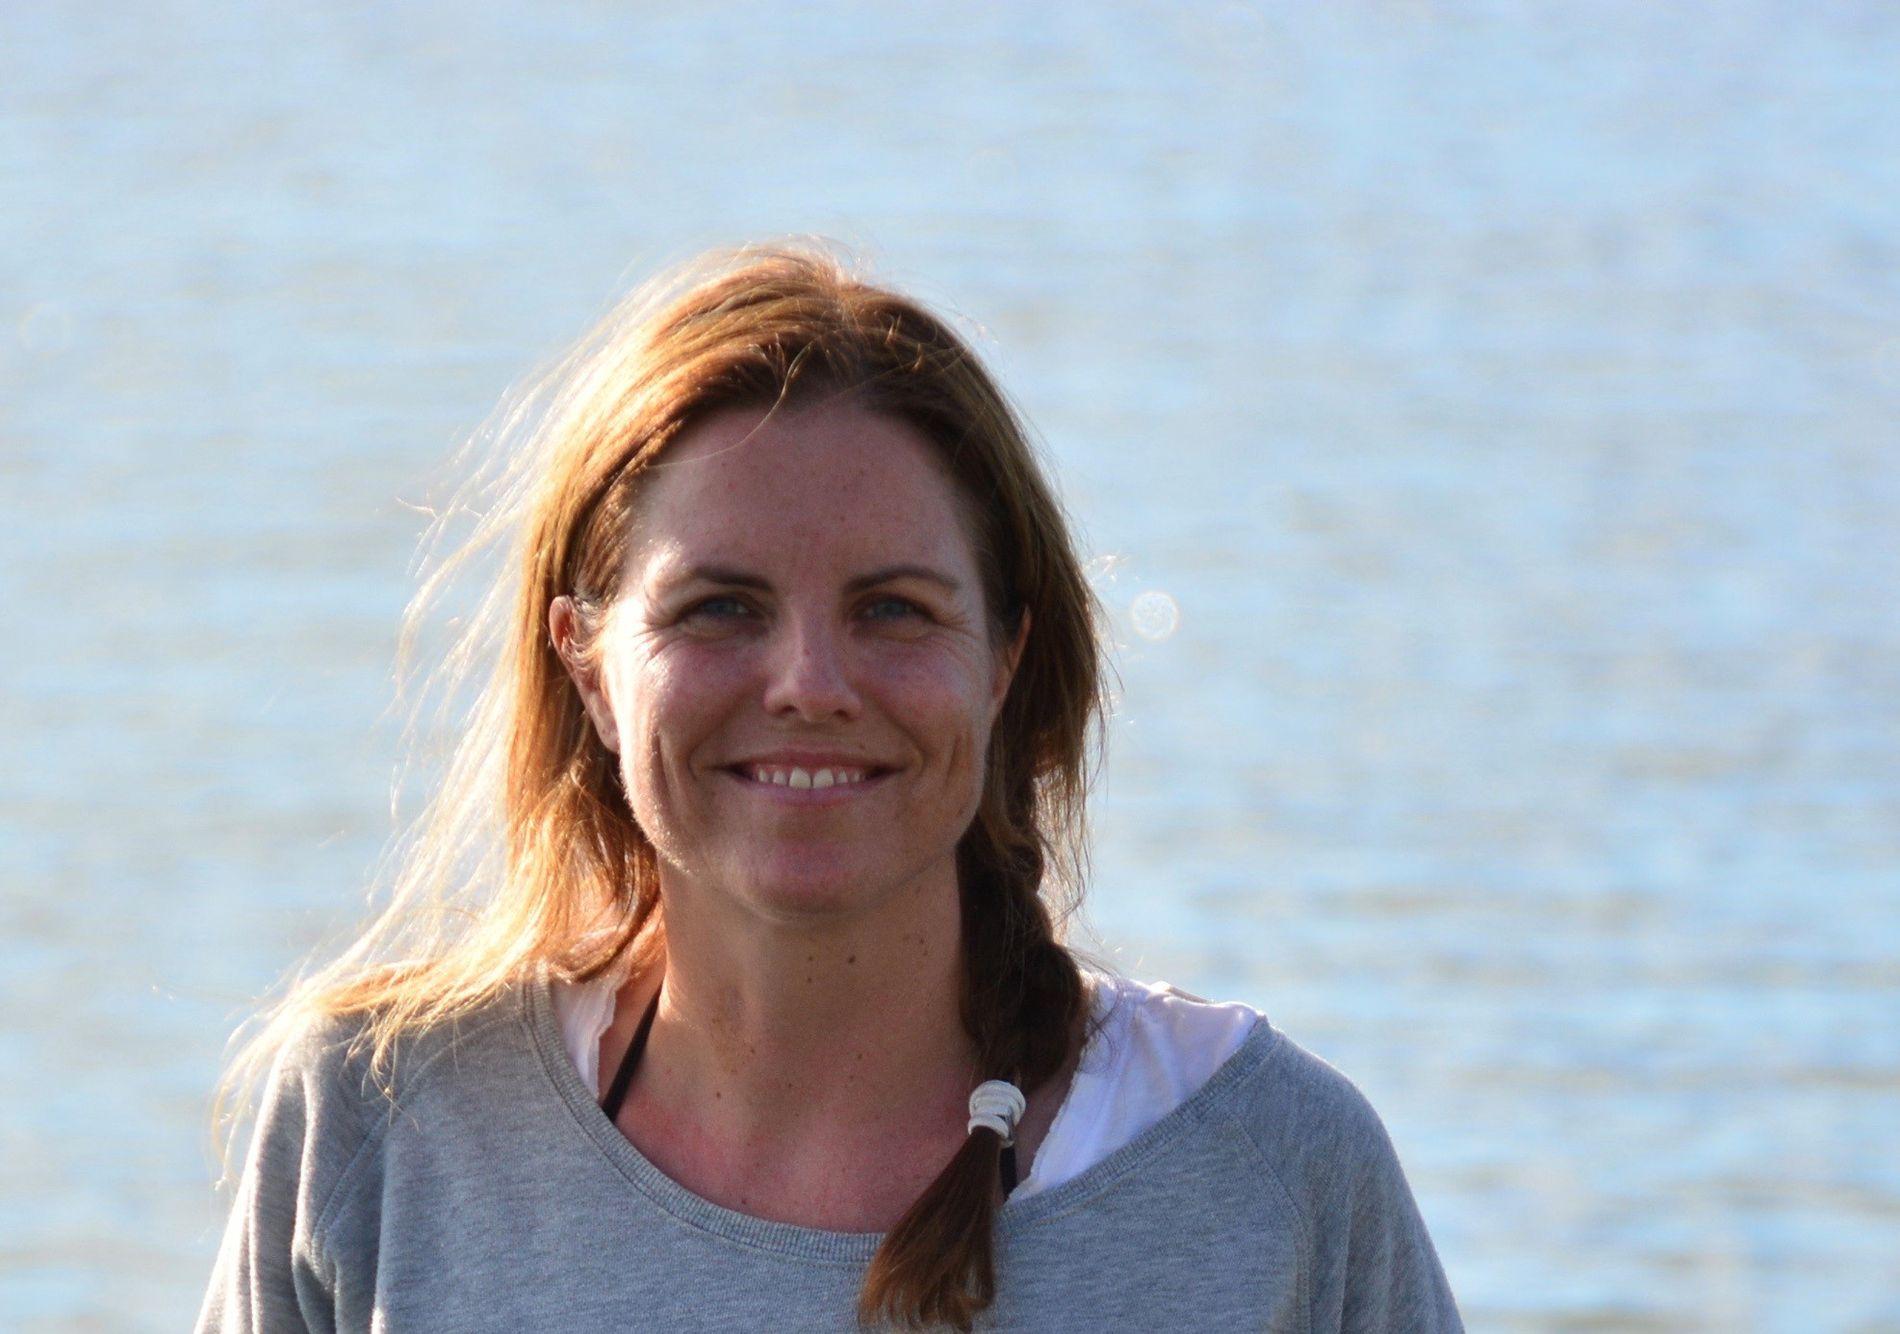 KRITISK: Karin Schaug i Norsk tollerforbund mener det er for lite penger og for dårlig bemanning på grensekontrollene.